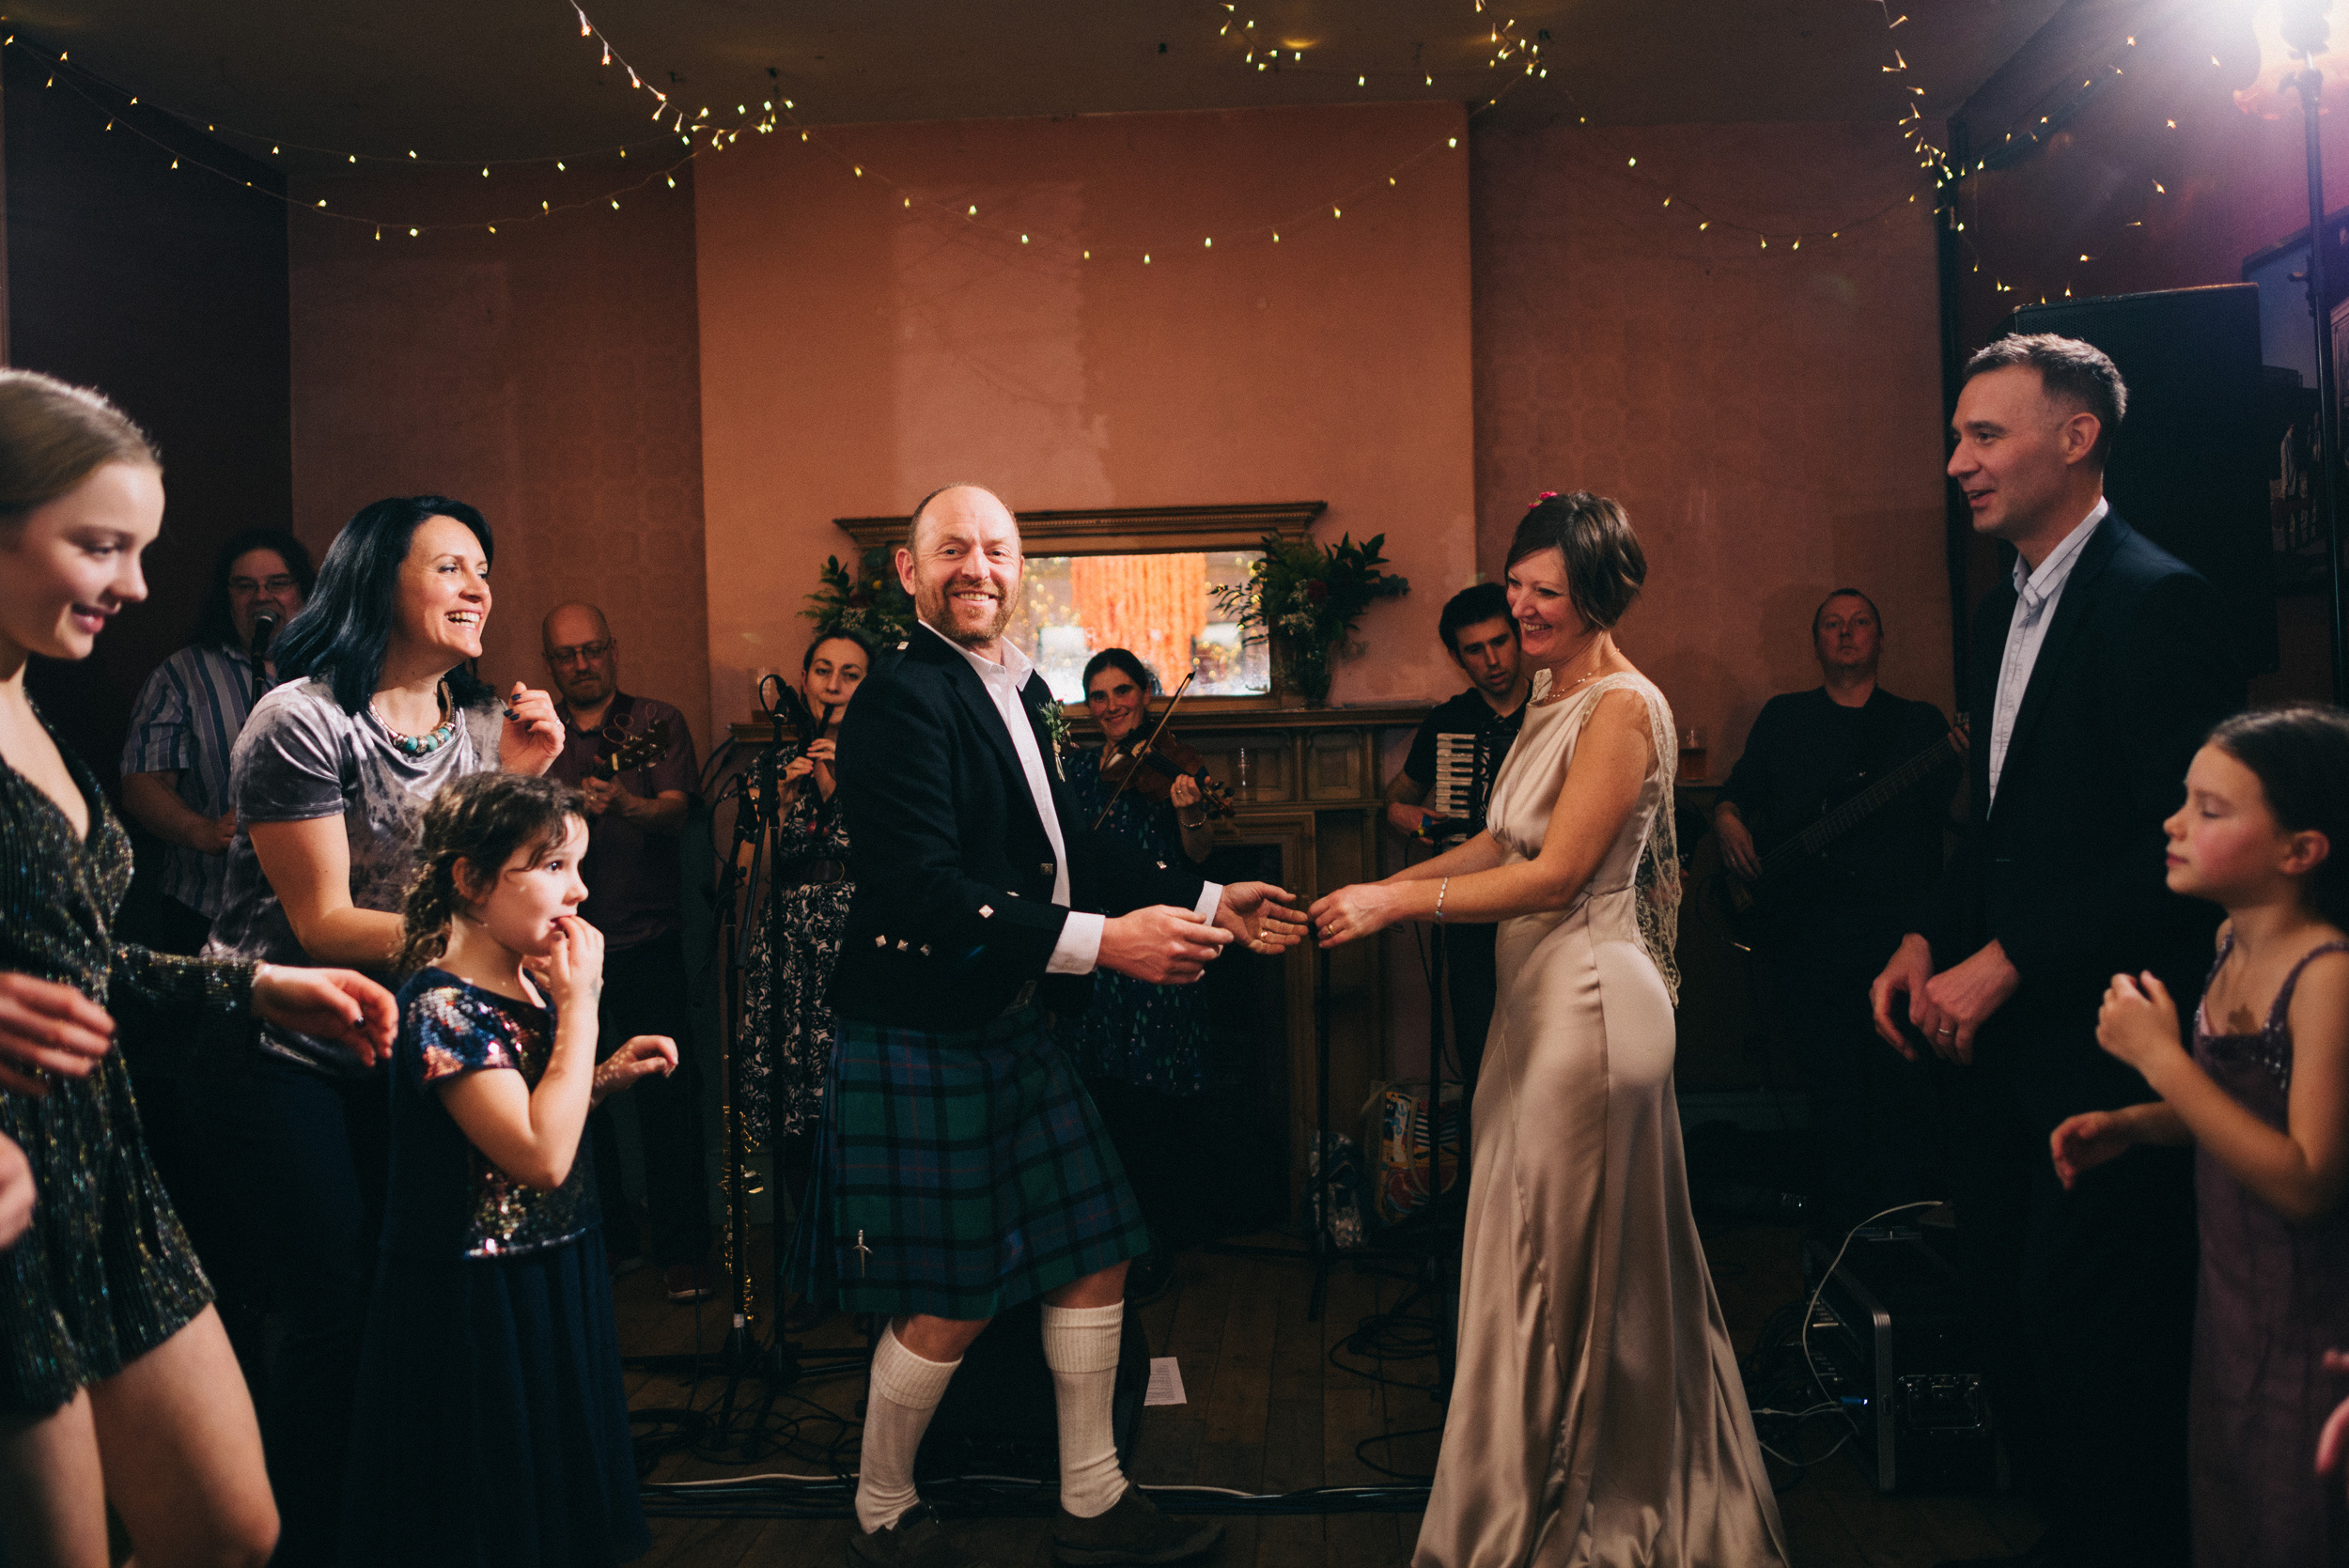 Alice-Bias-Cut-Silk-Wedding-Dress-Kate-Beaumont-Sheffield-Botanical-Gardens-by-Peakography-27.jpg